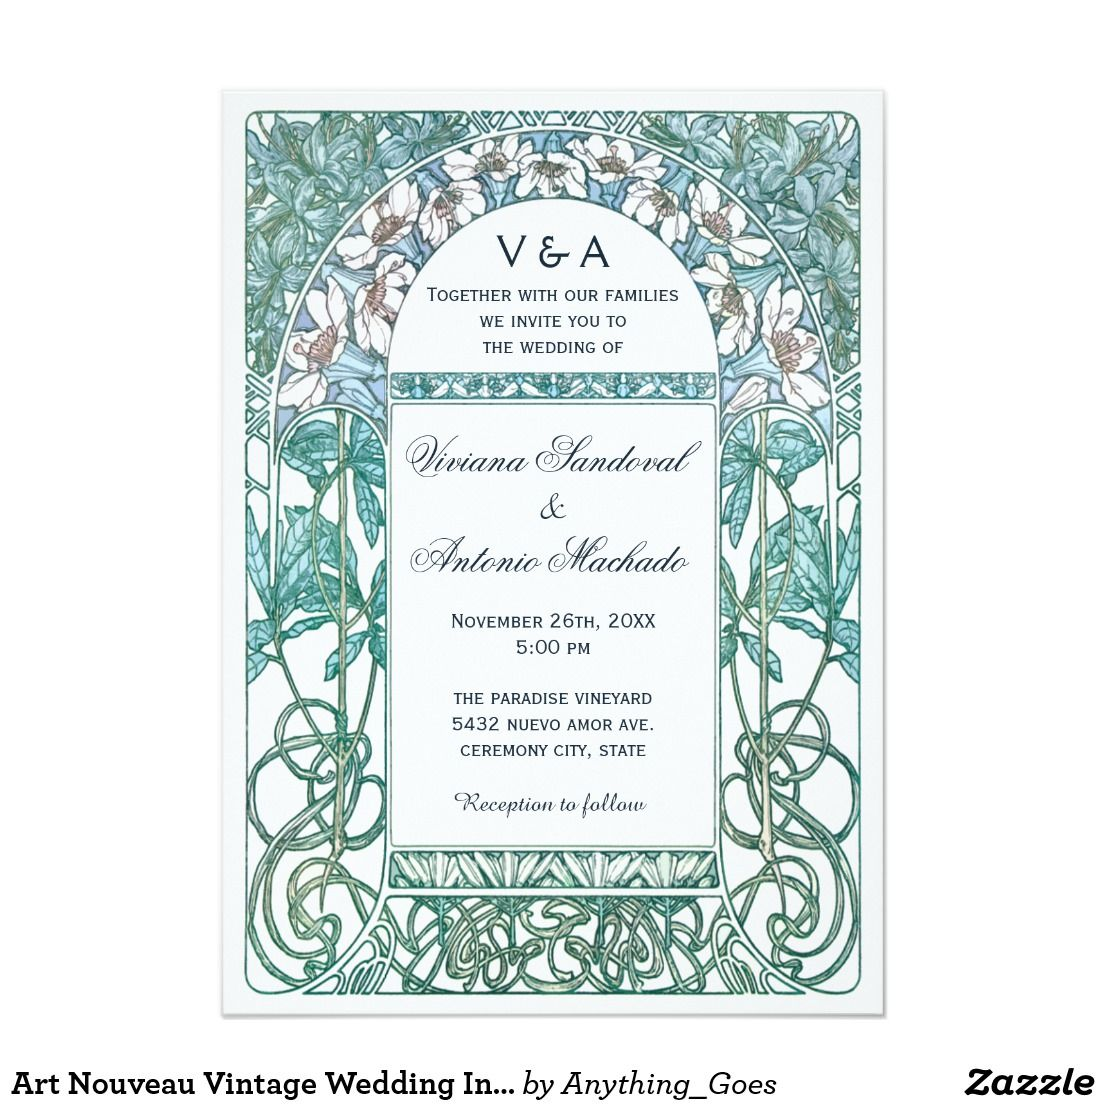 Art Nouveau Vintage Wedding Invitations VI | Wedding | Pinterest ...